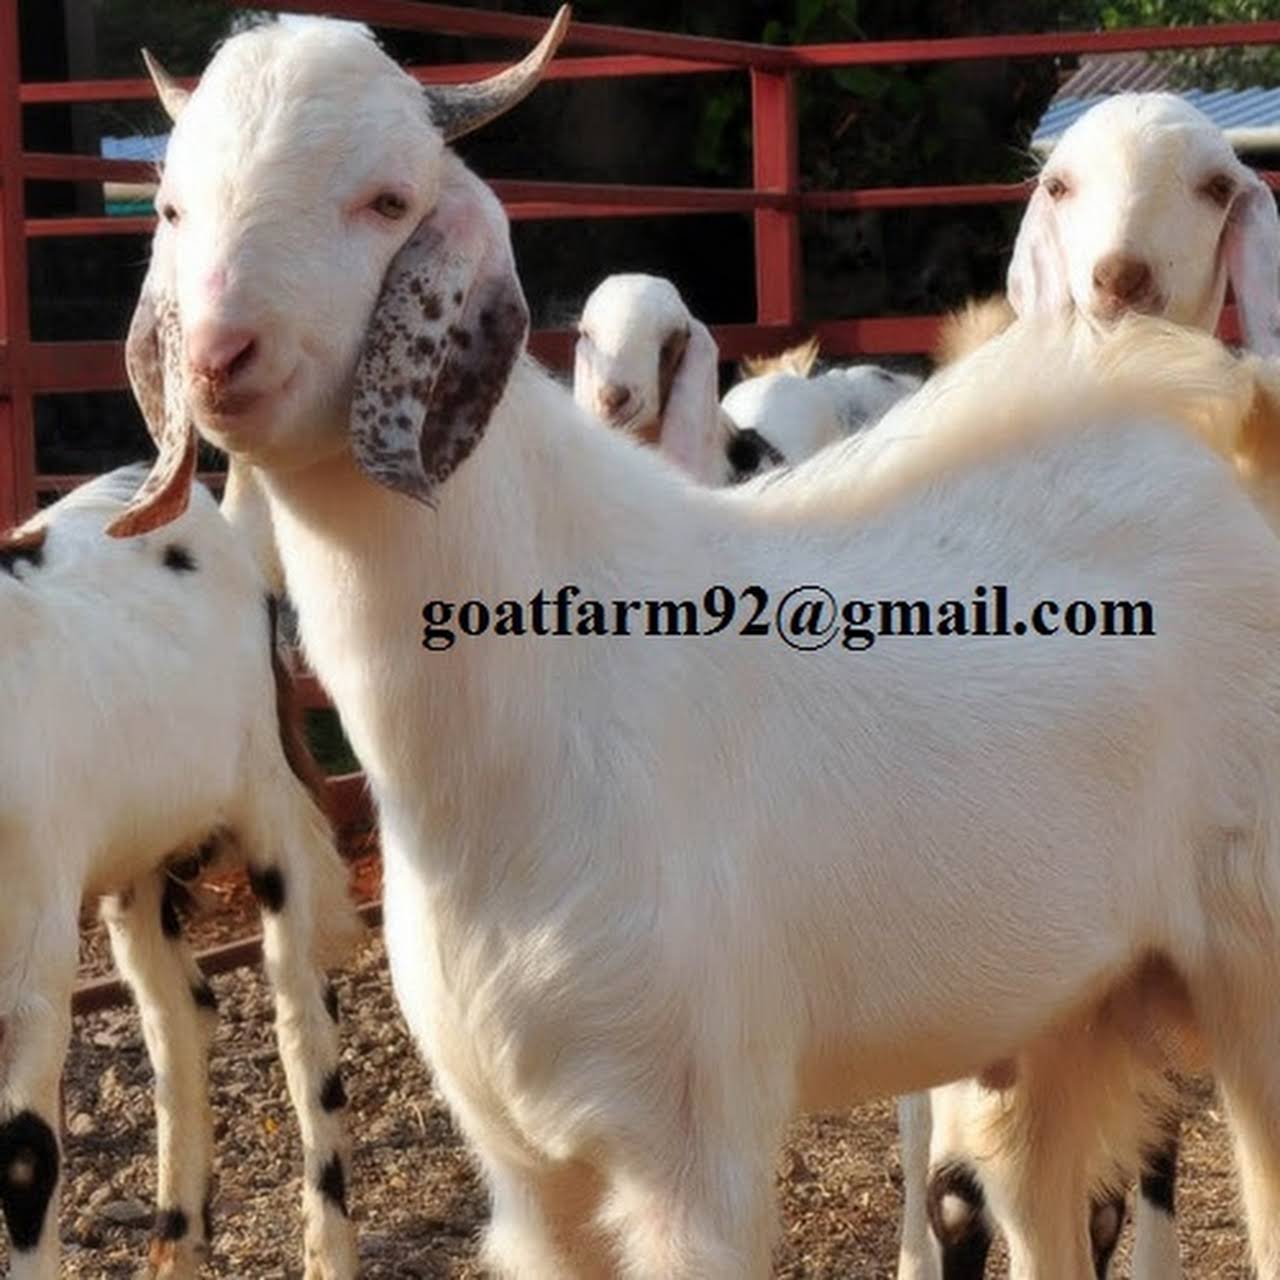 Goat Farming startup - Goat Farm startup